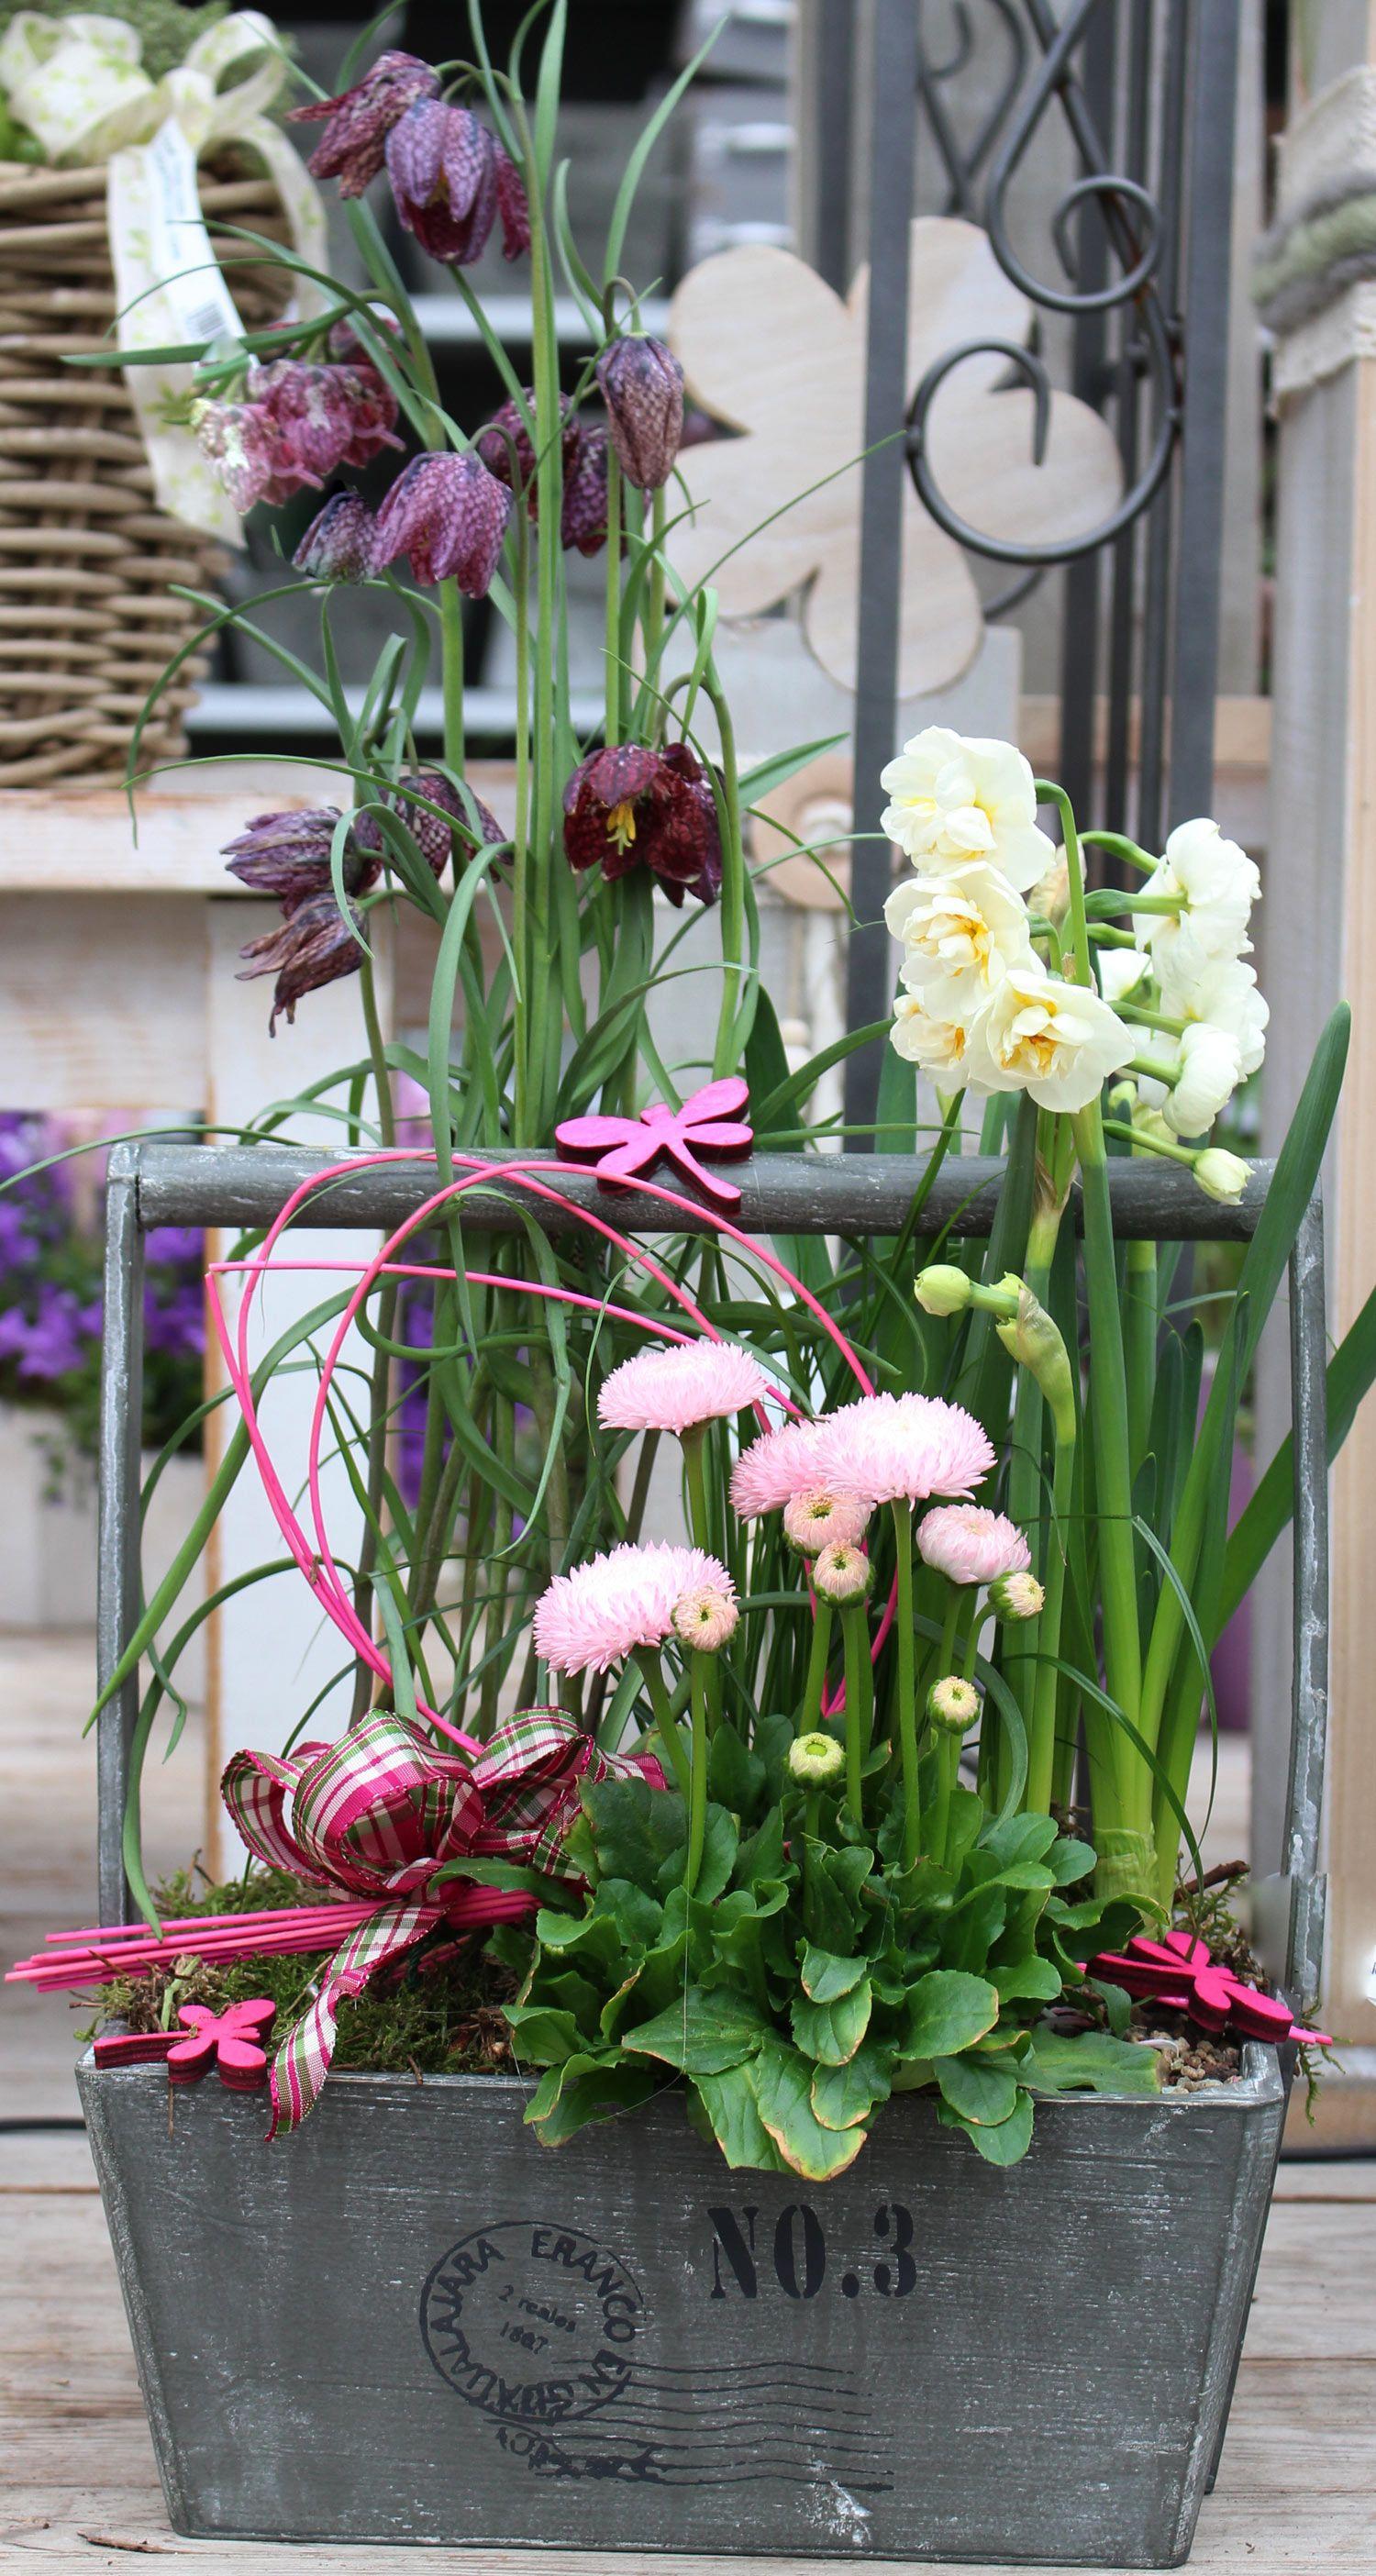 Traumhaft Schön Frühlings Dekoration